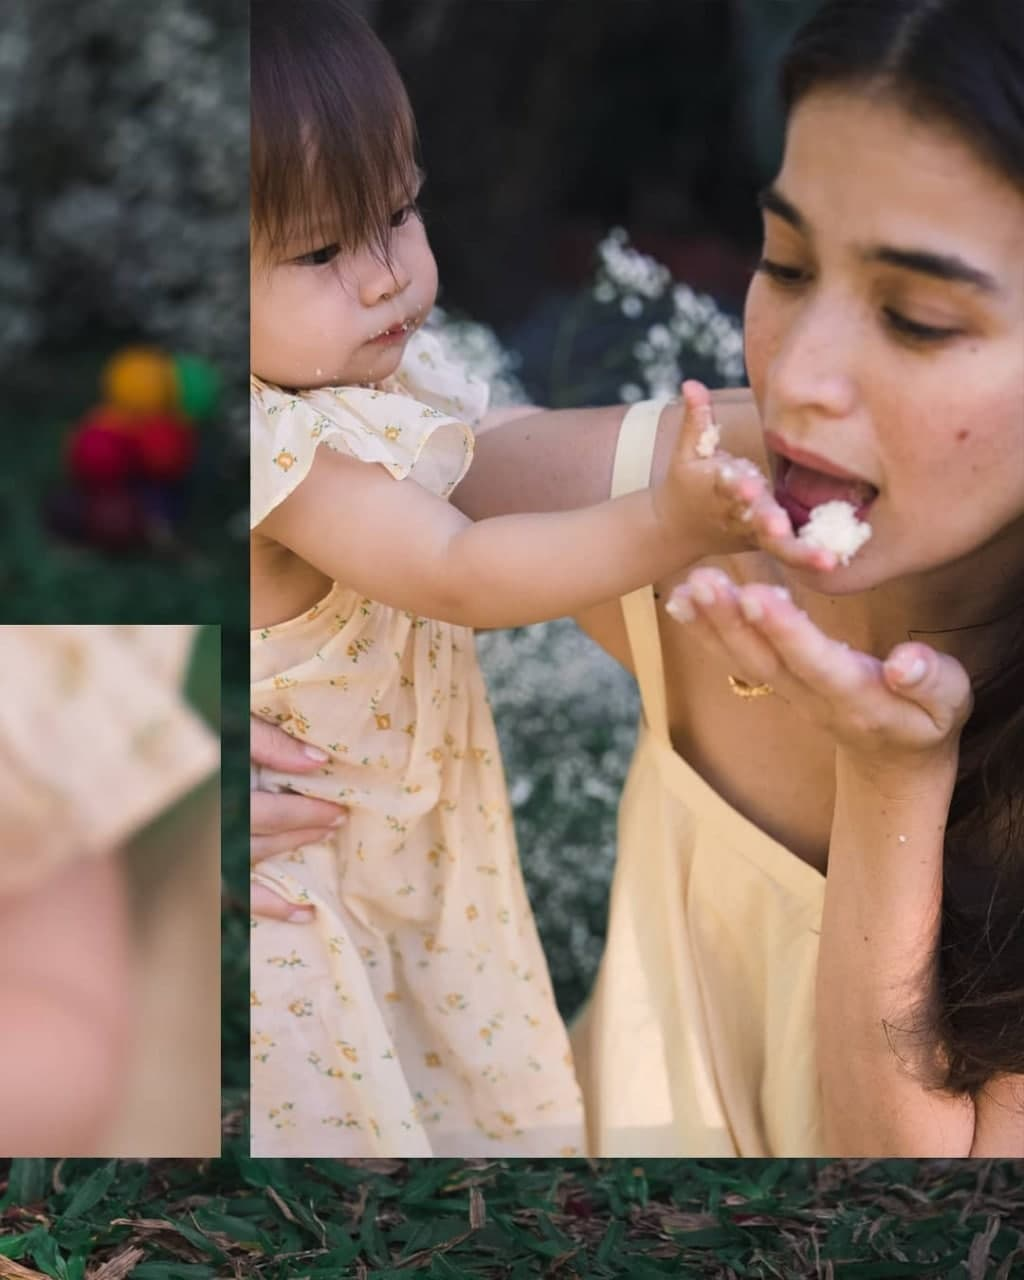 Dahlia Amélie sharing her cake with her mom